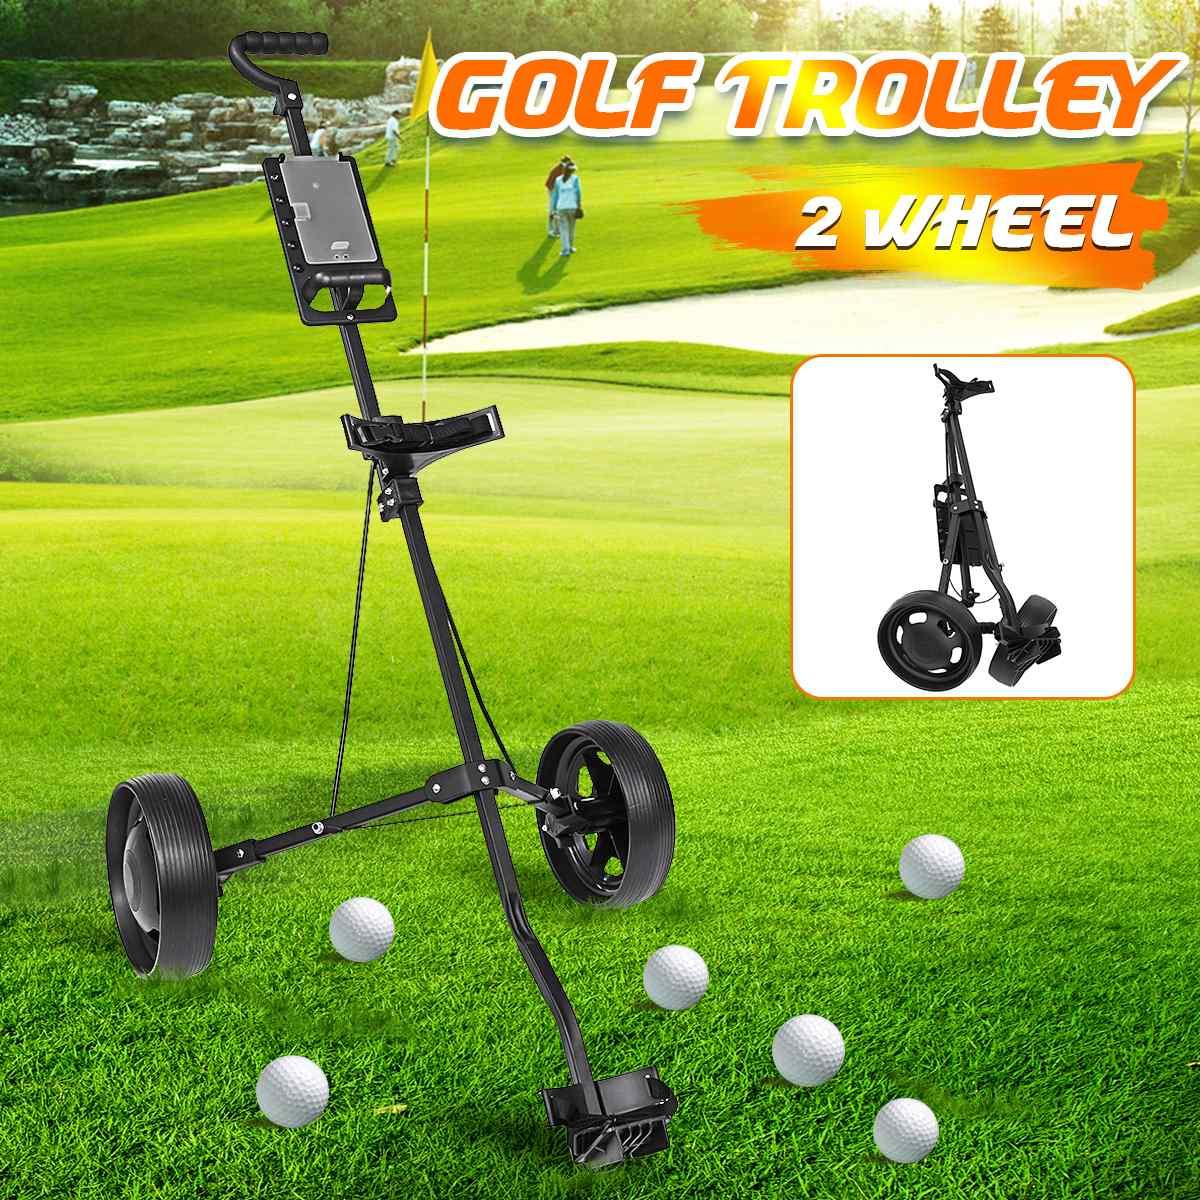 Golf Pull Cart Iron Black Adjustable Golf Trolley Cart 2 Wheels Push Pull Golf Cart Aluminium Alloy Foldable Trolley With Brake 1